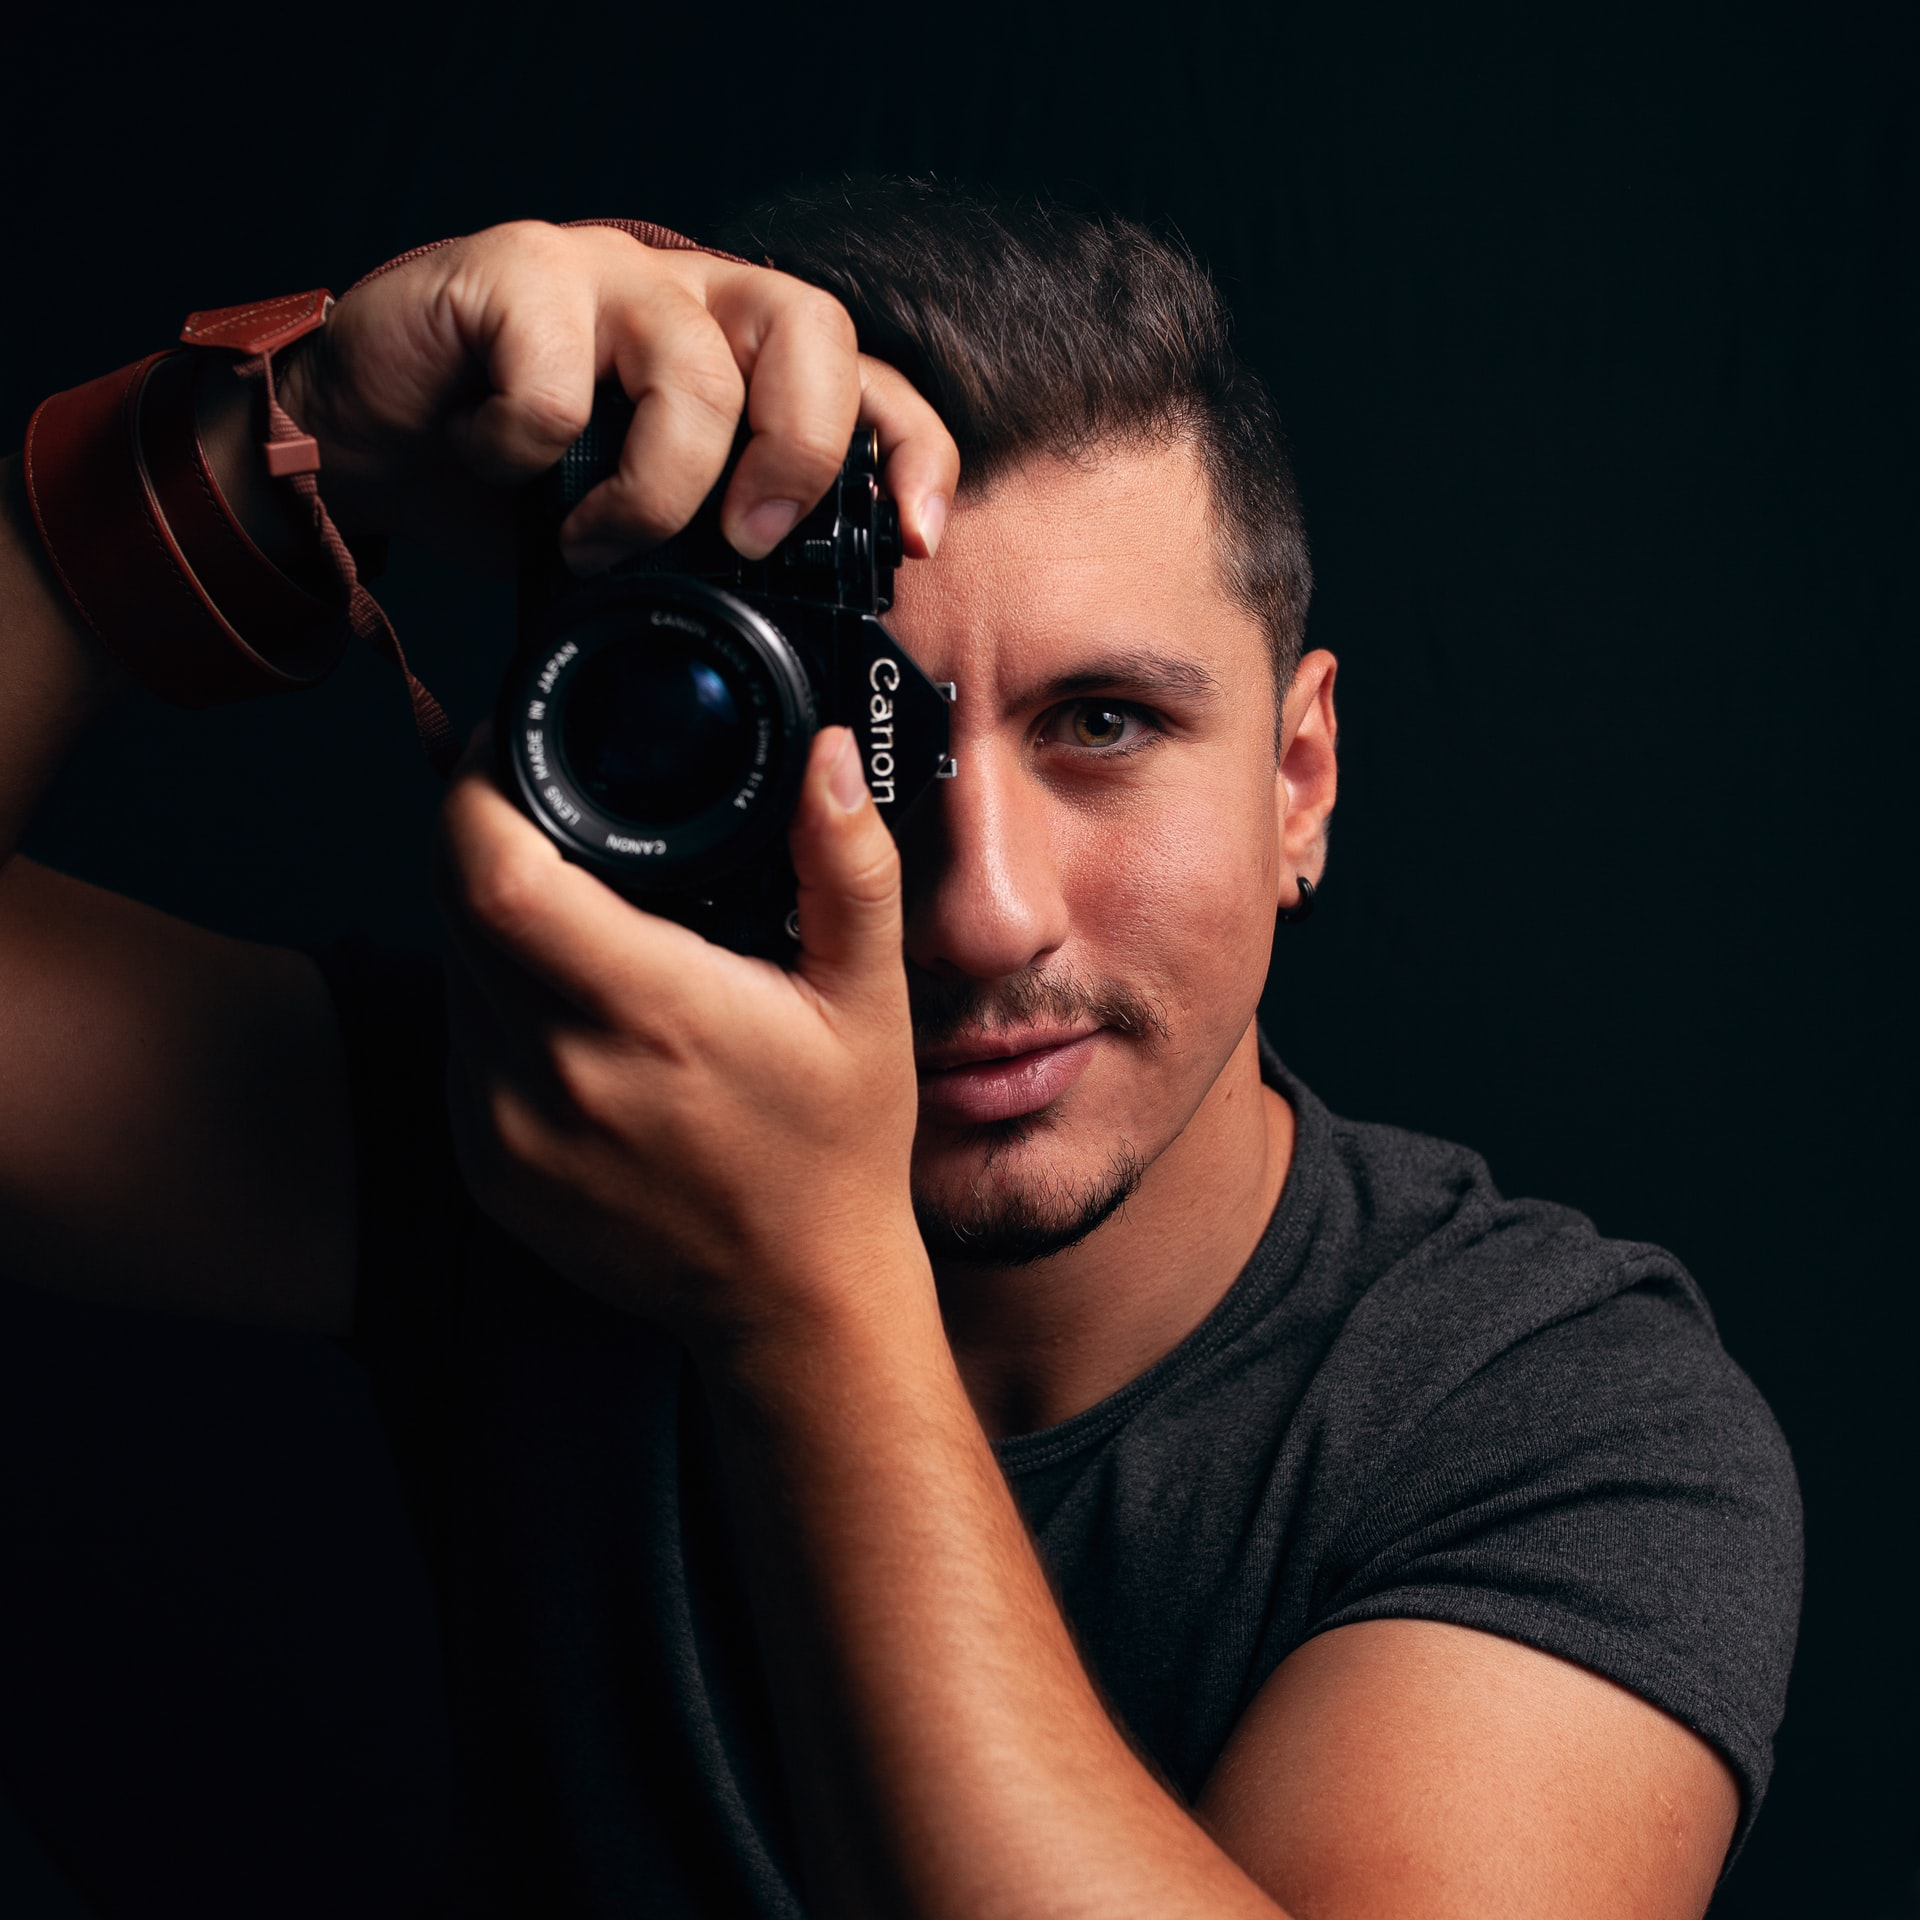 Just Shoot Me Photographs